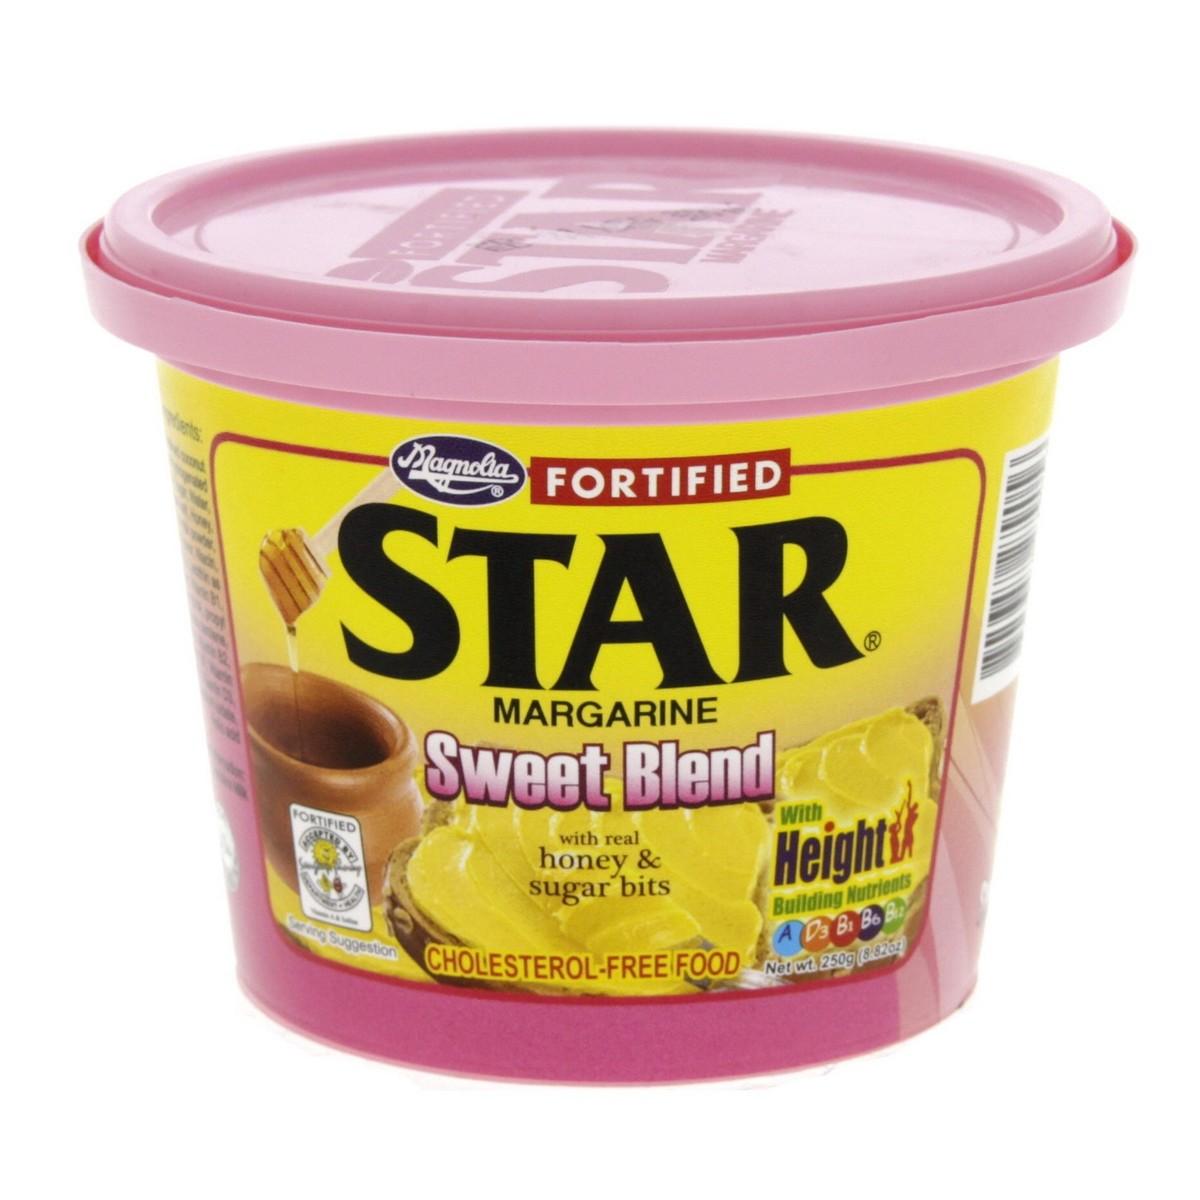 Buy Star Margarine Sweet Blend With Real Honey & Sugar Bits